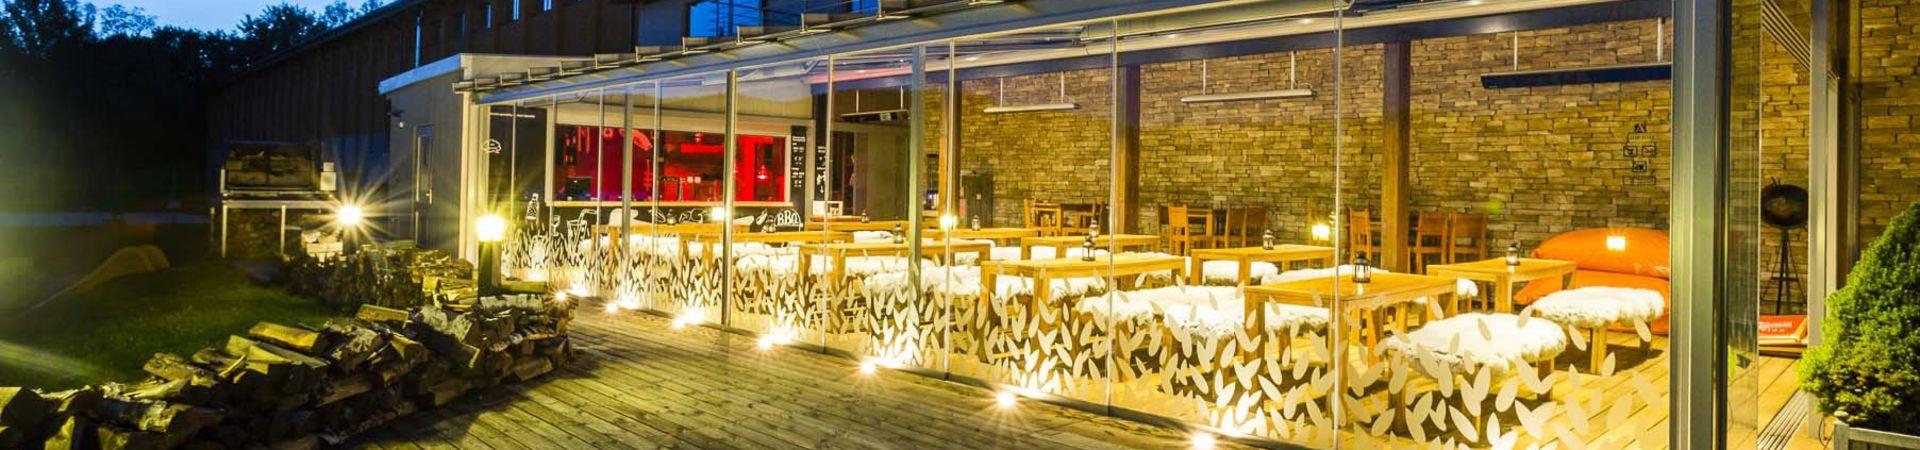 Amenity Resort Lipno - Restaurant Blue Lipno